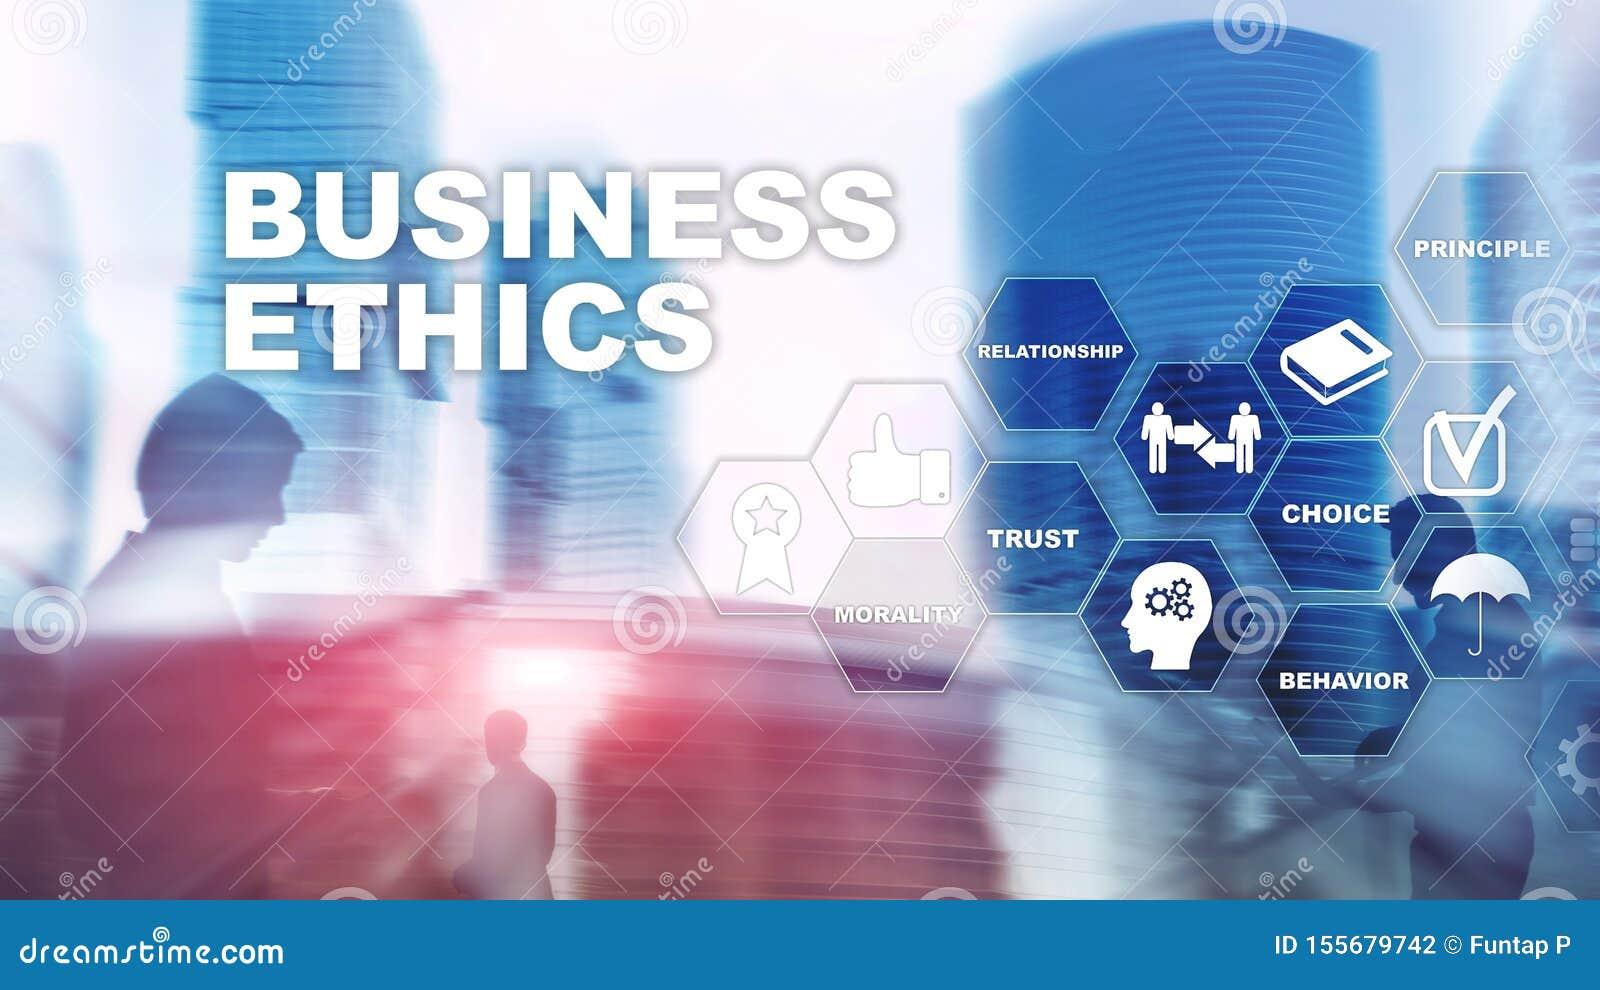 Business Ethnics Philosophy Responsibility Honesty Concept. Mixed media background.